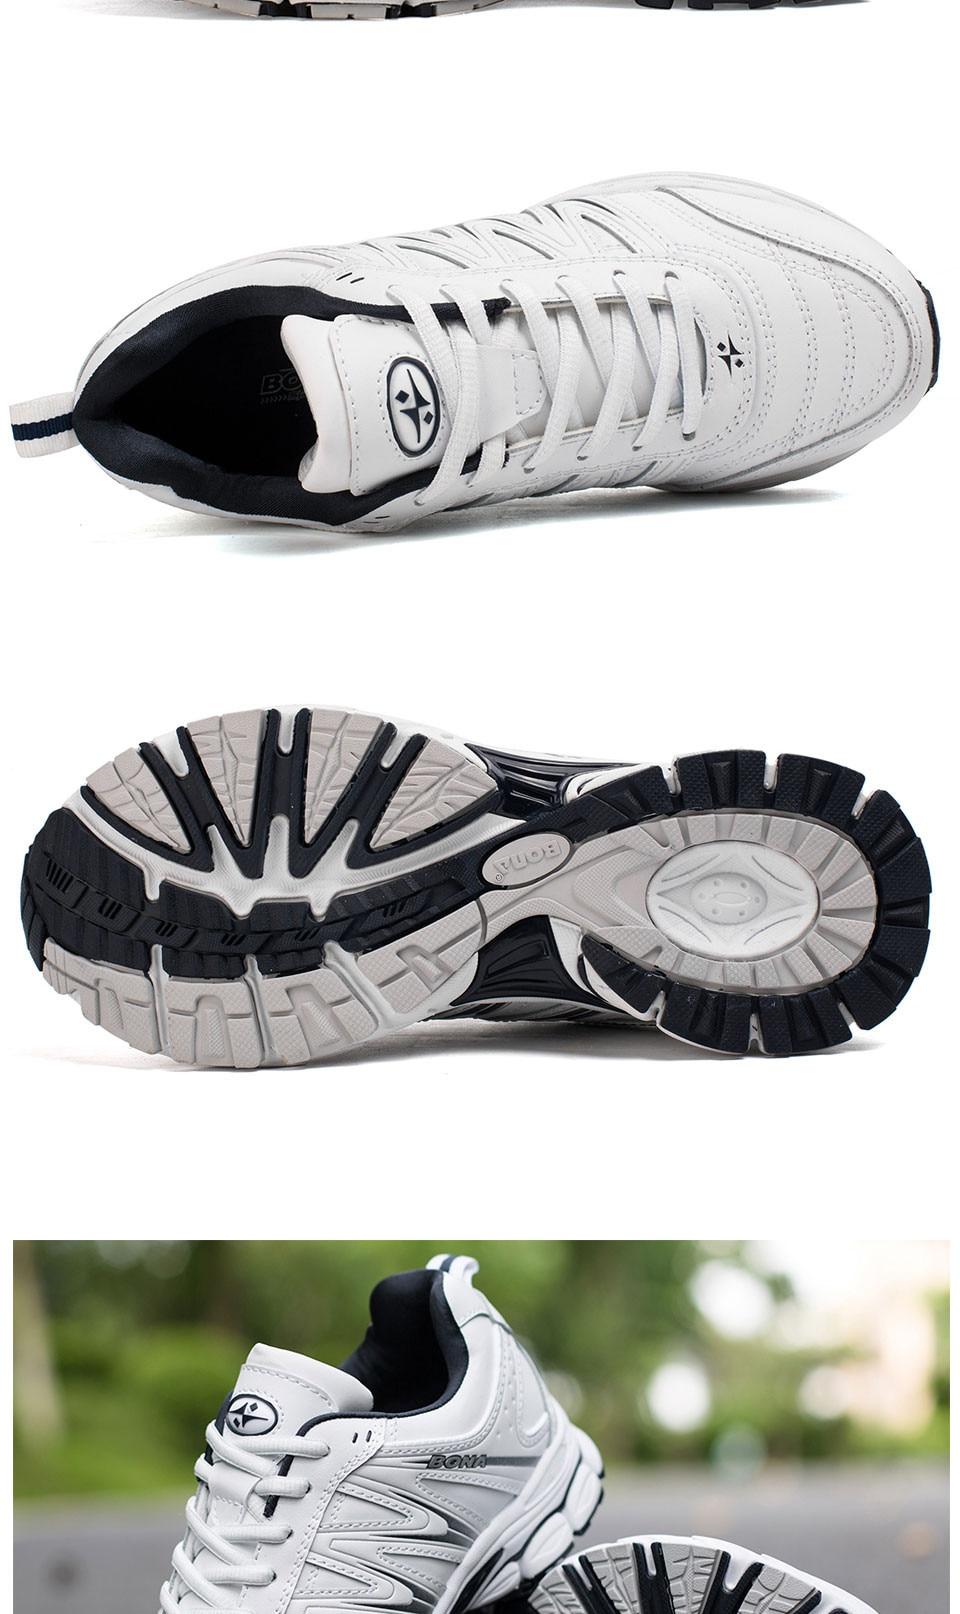 H437d42fad48a476c8874cb72c292de65B BONA 2019 New Designers Casual Shoes Men Style Cow Split Sneakers Male Lightweight Outdoor Fashion Footwear Man Trendy Comfy